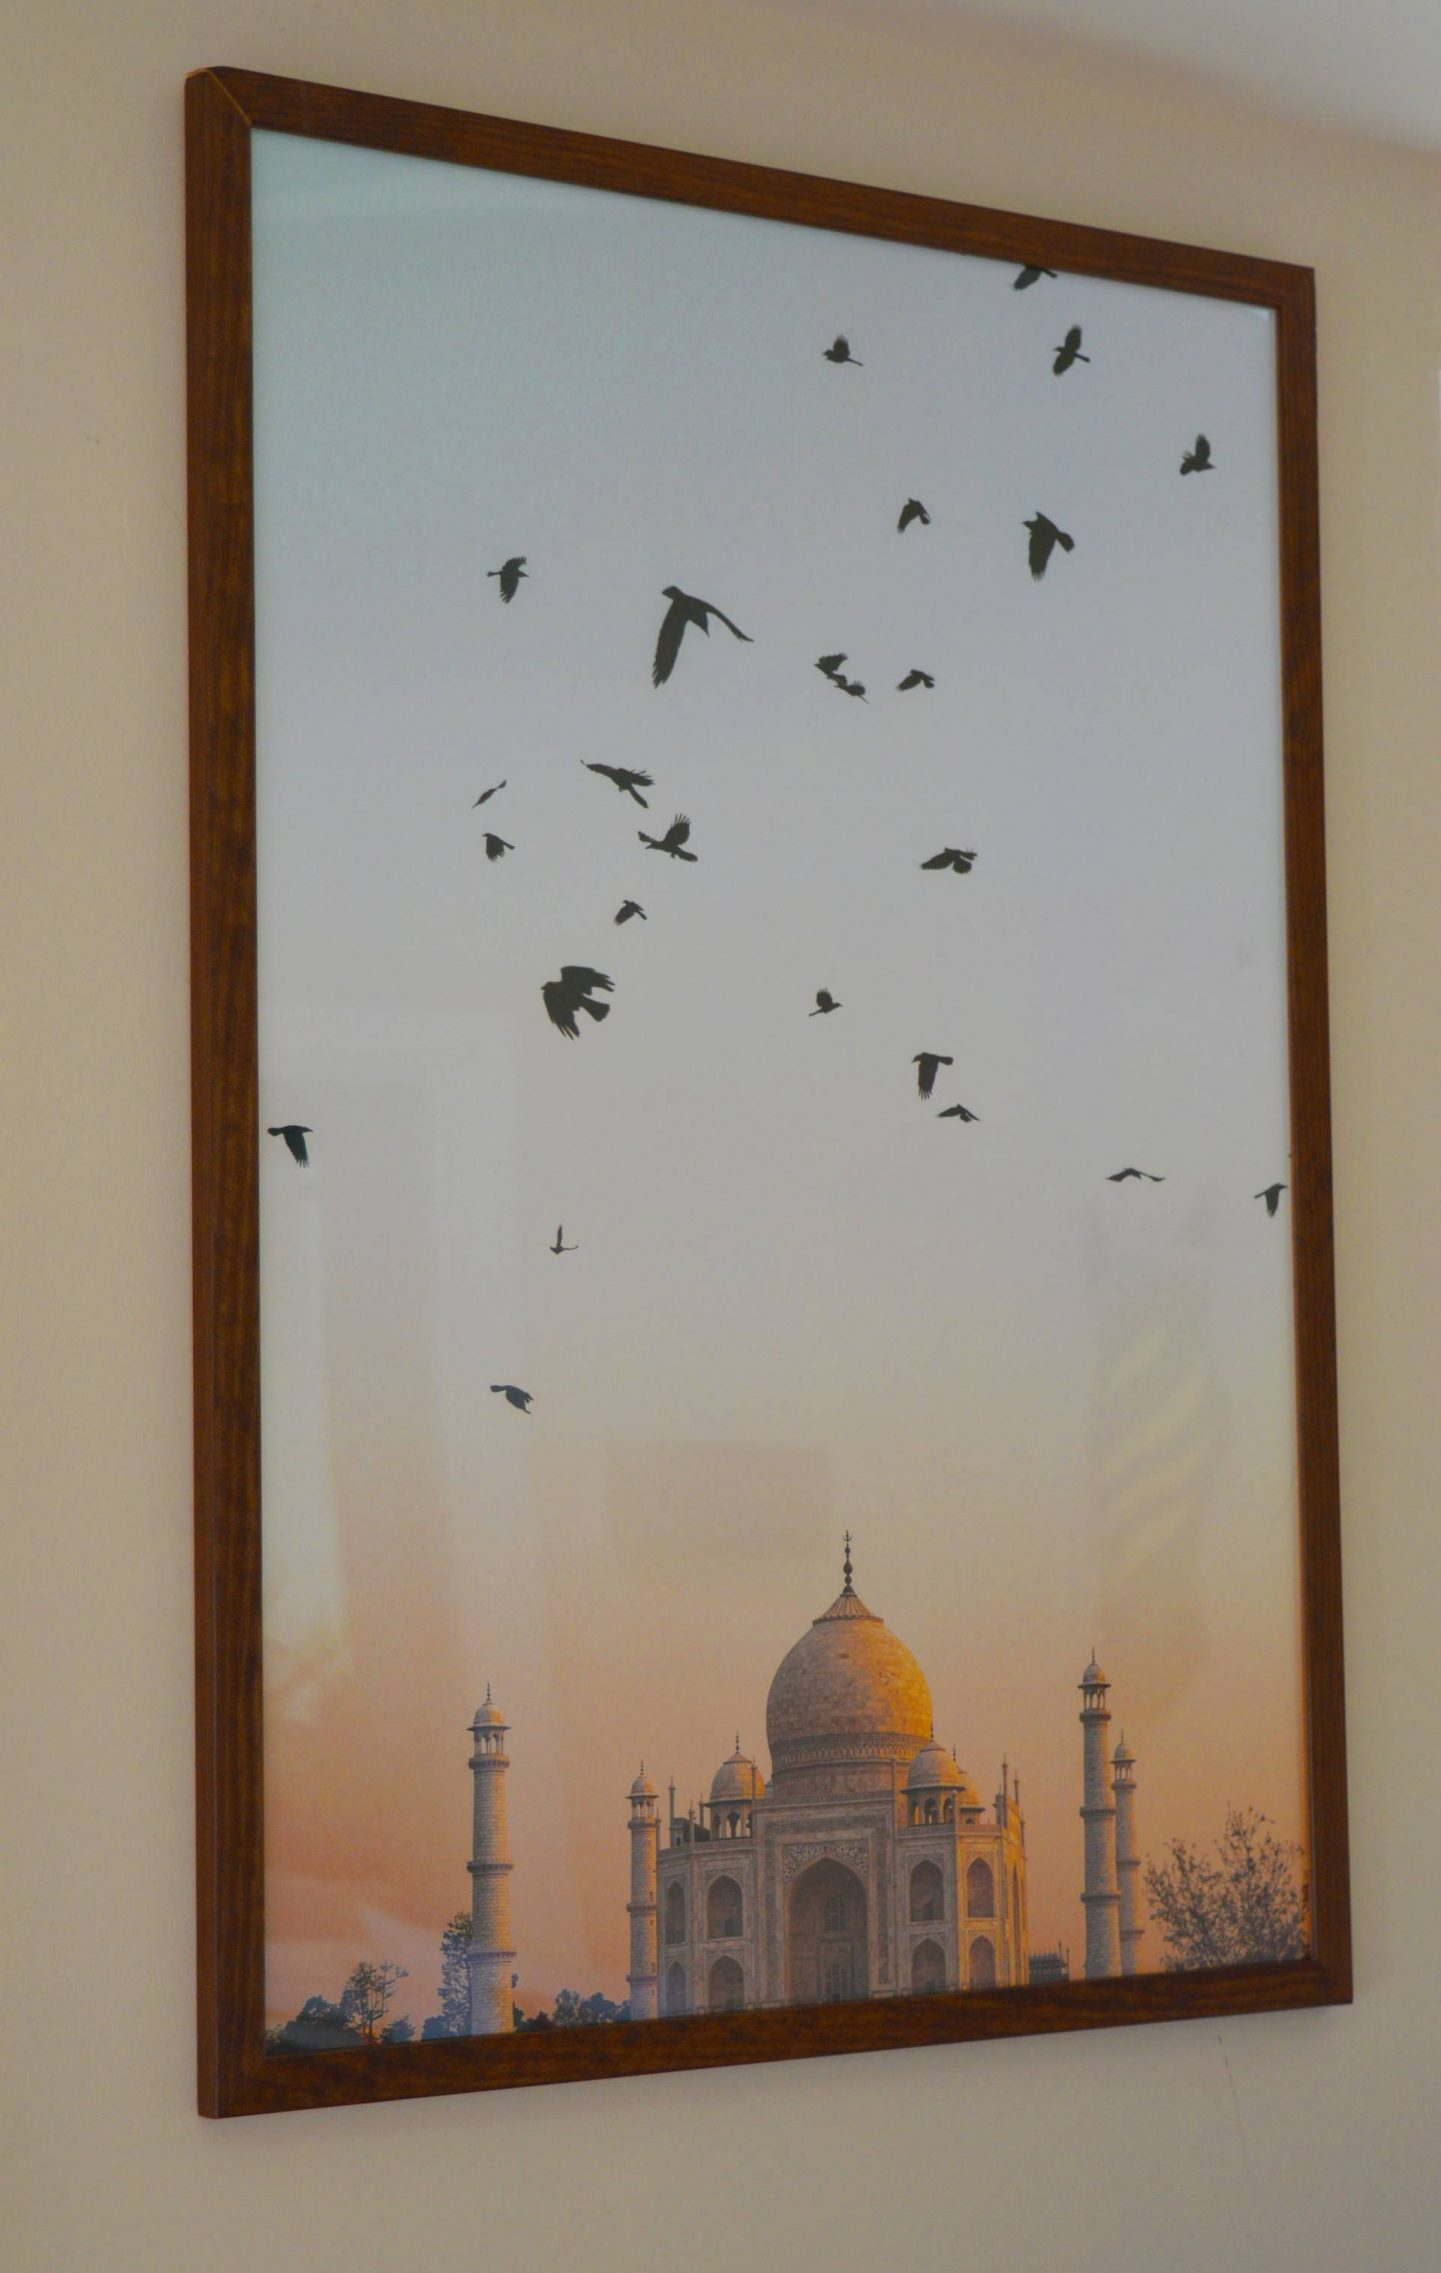 Budget-Friendly Wall Art to Transform Your Home, Poster Store Taj Mahal print in walnut frame